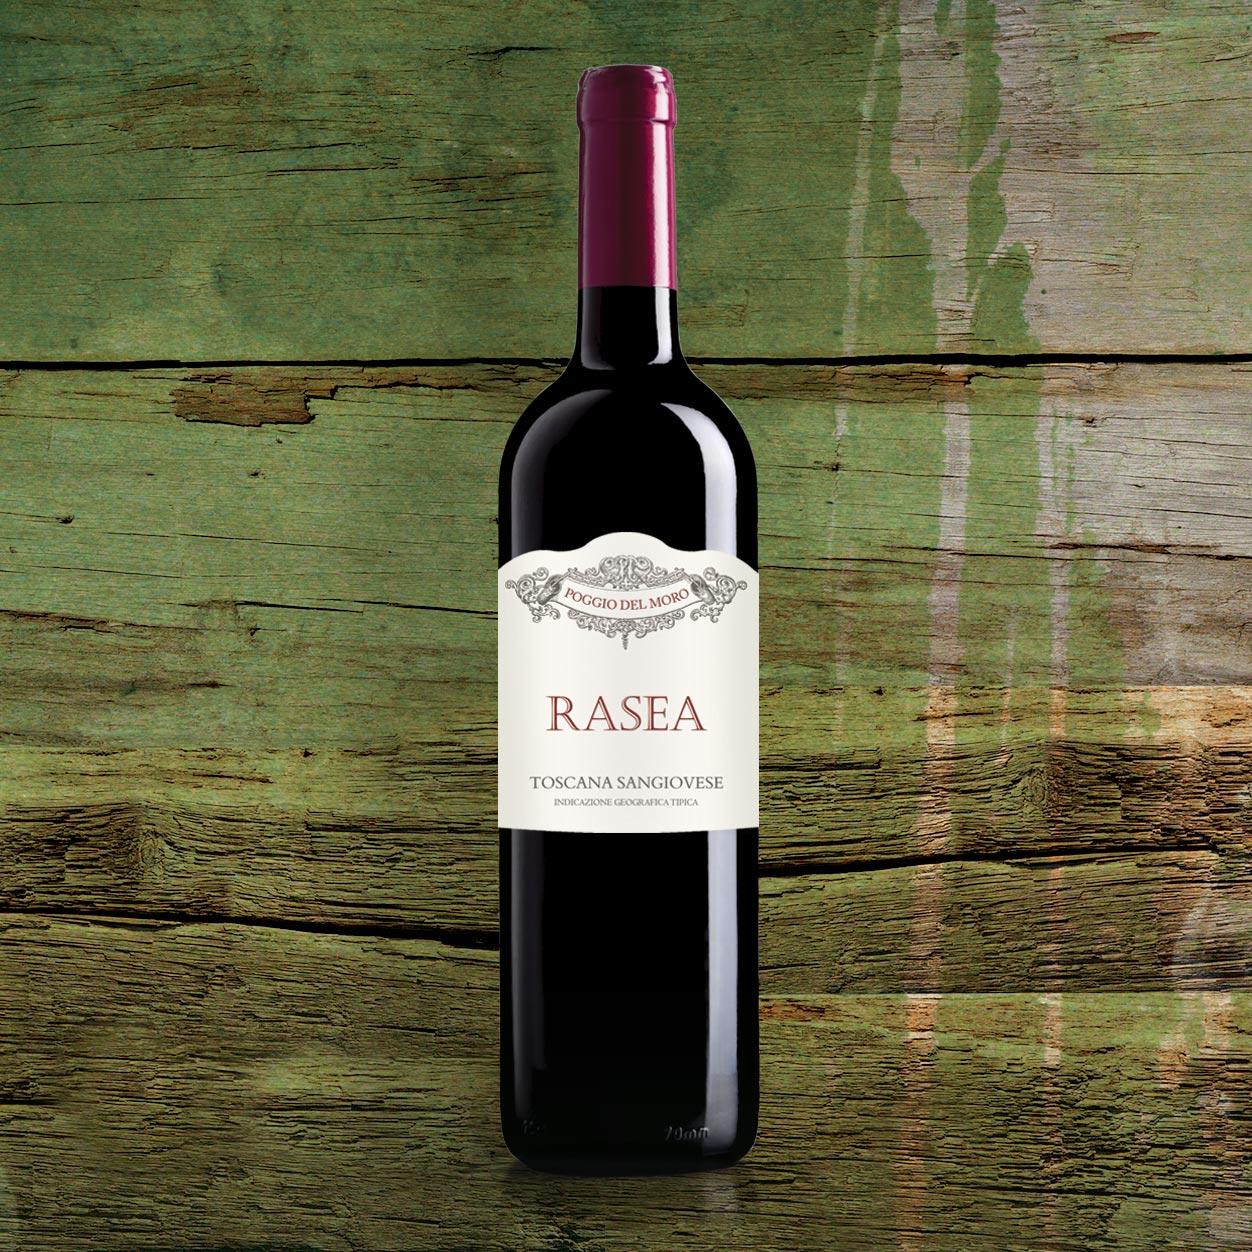 RASEA-Red-Wine-Poggio-del-Moro-Winery-Cantina-Vino-Tuscany-Italy-Chianciano-Montepulciano